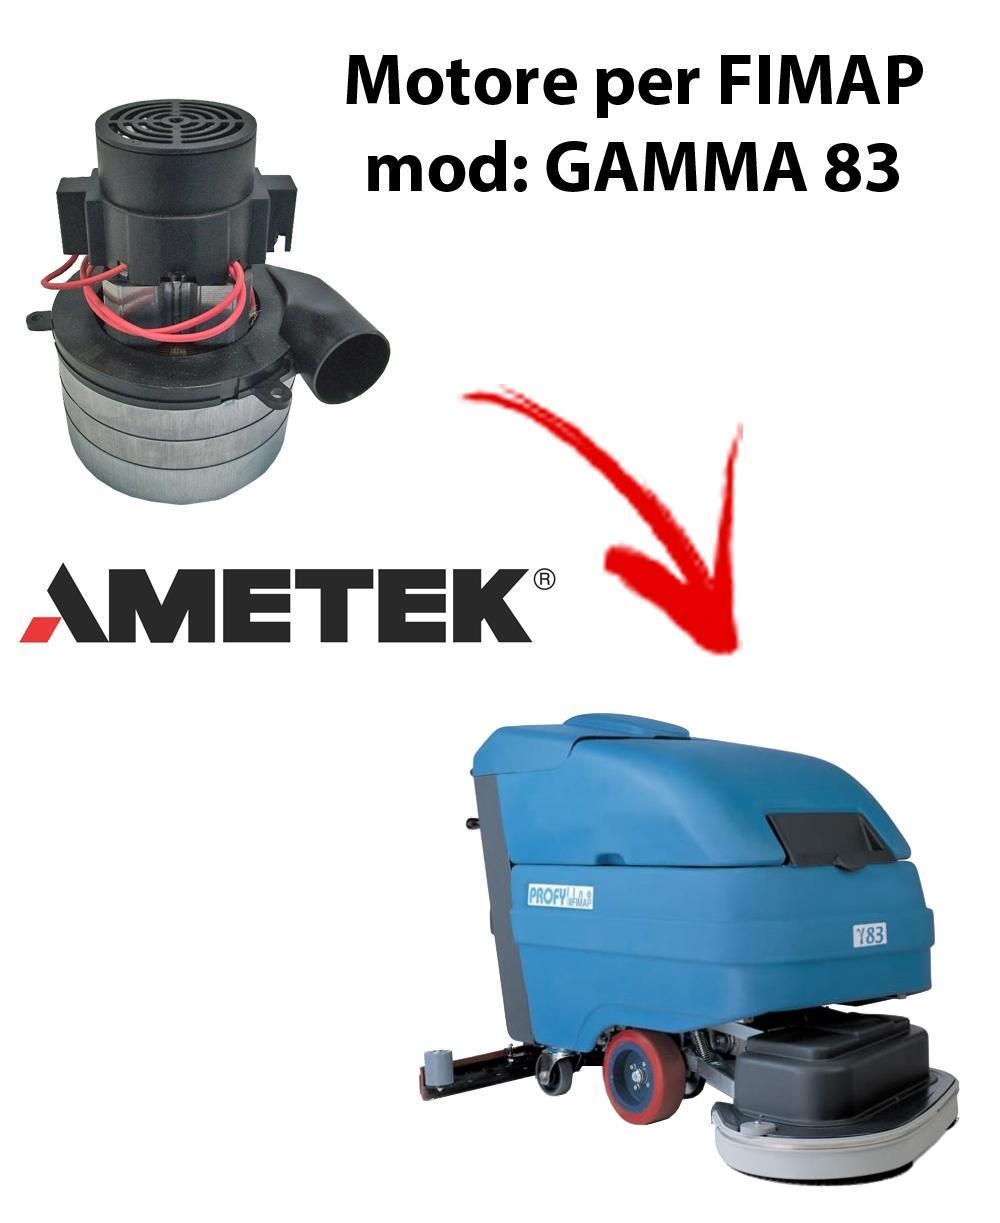 GAMMA 83 Vacuum motors AMETEK Italia for scrubber dryer FIMAP